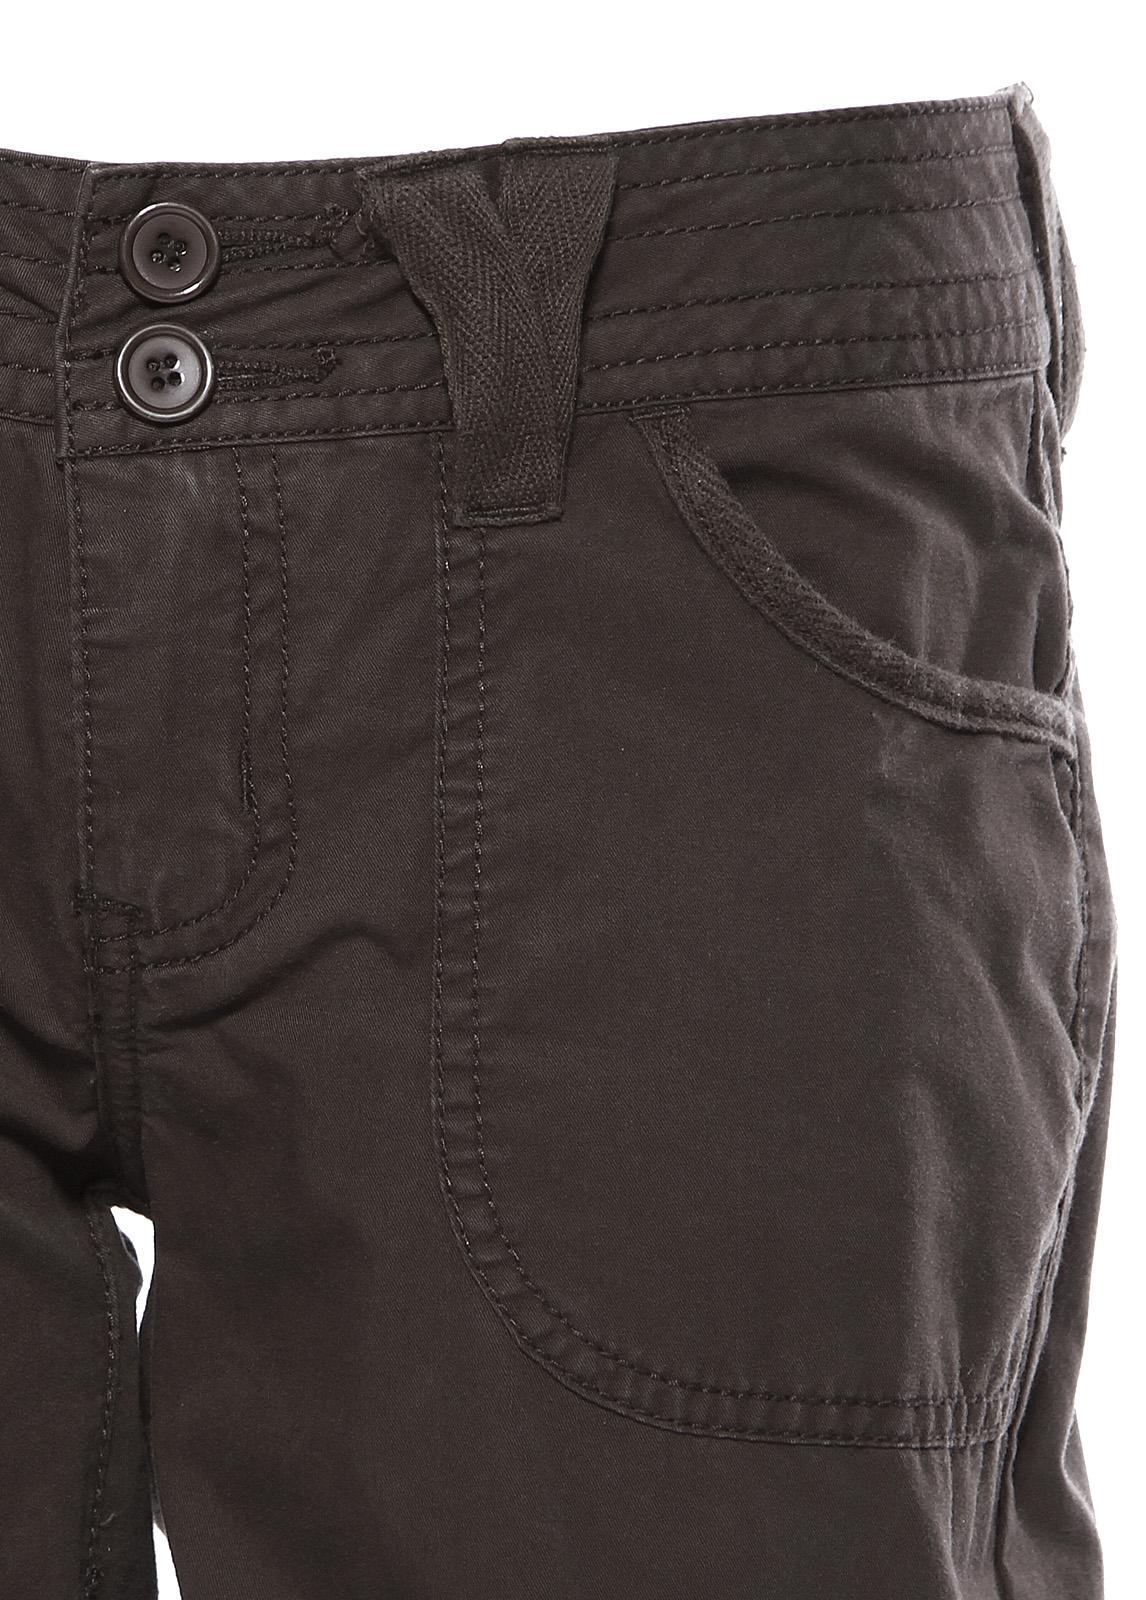 Model Dickies FP223 Womenu0026#39;s Cargo/Multi-Pocket Pant | EBay